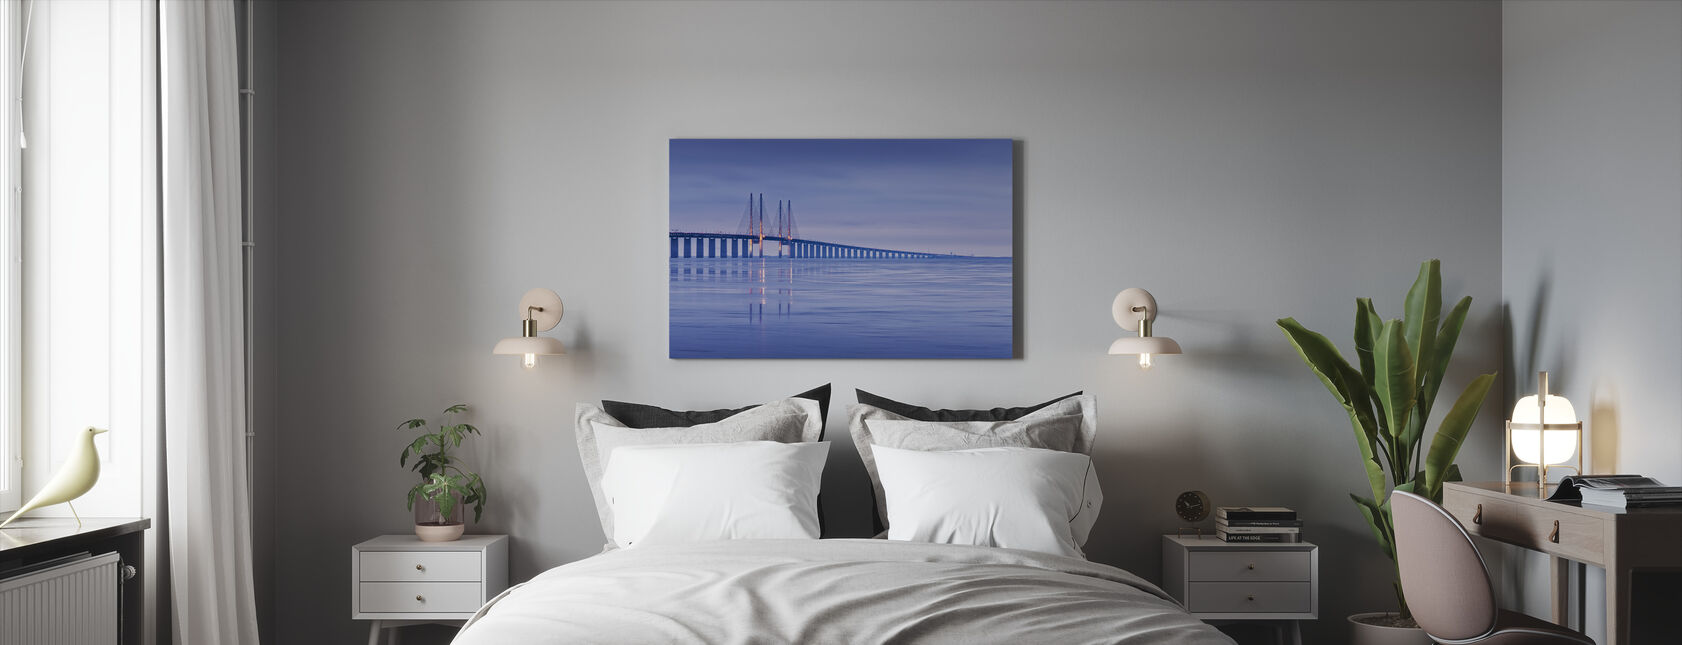 Öresundsbron - Canvastavla - Sovrum